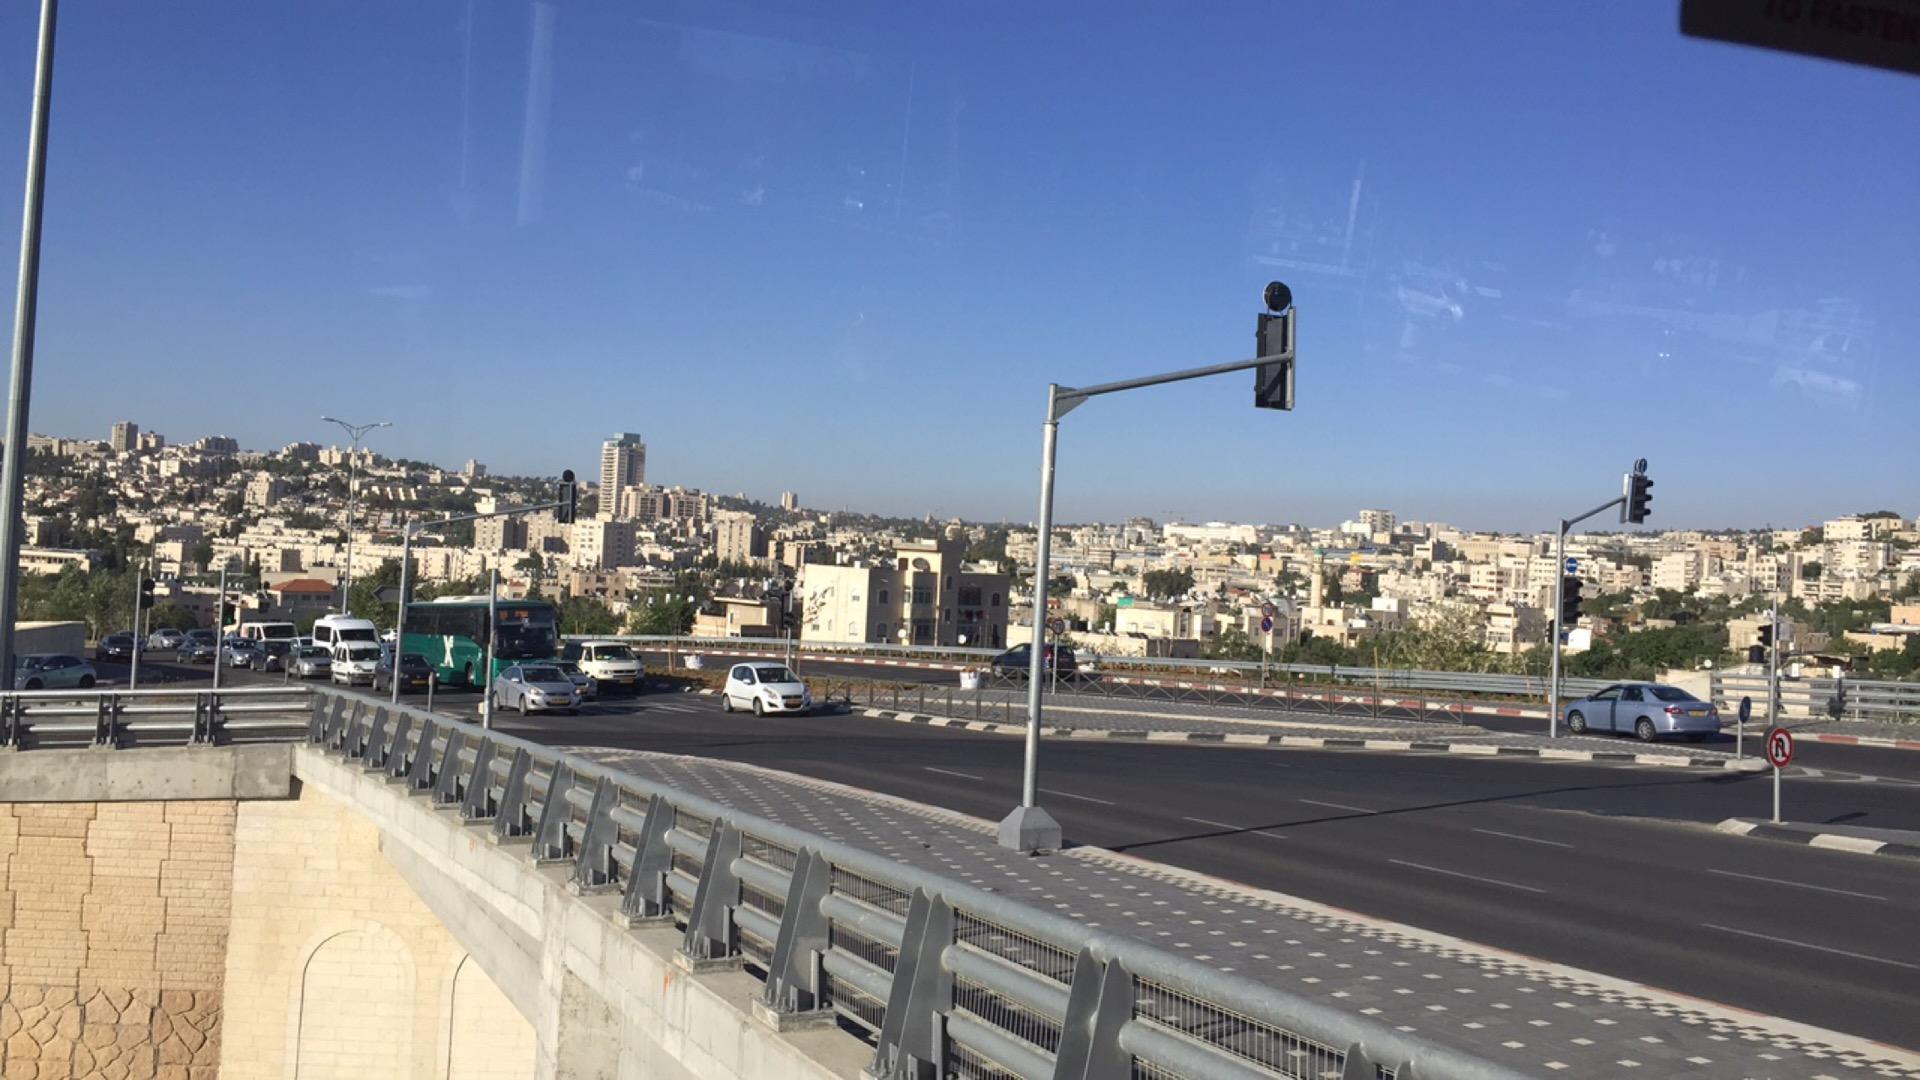 Coming into Jerusalem